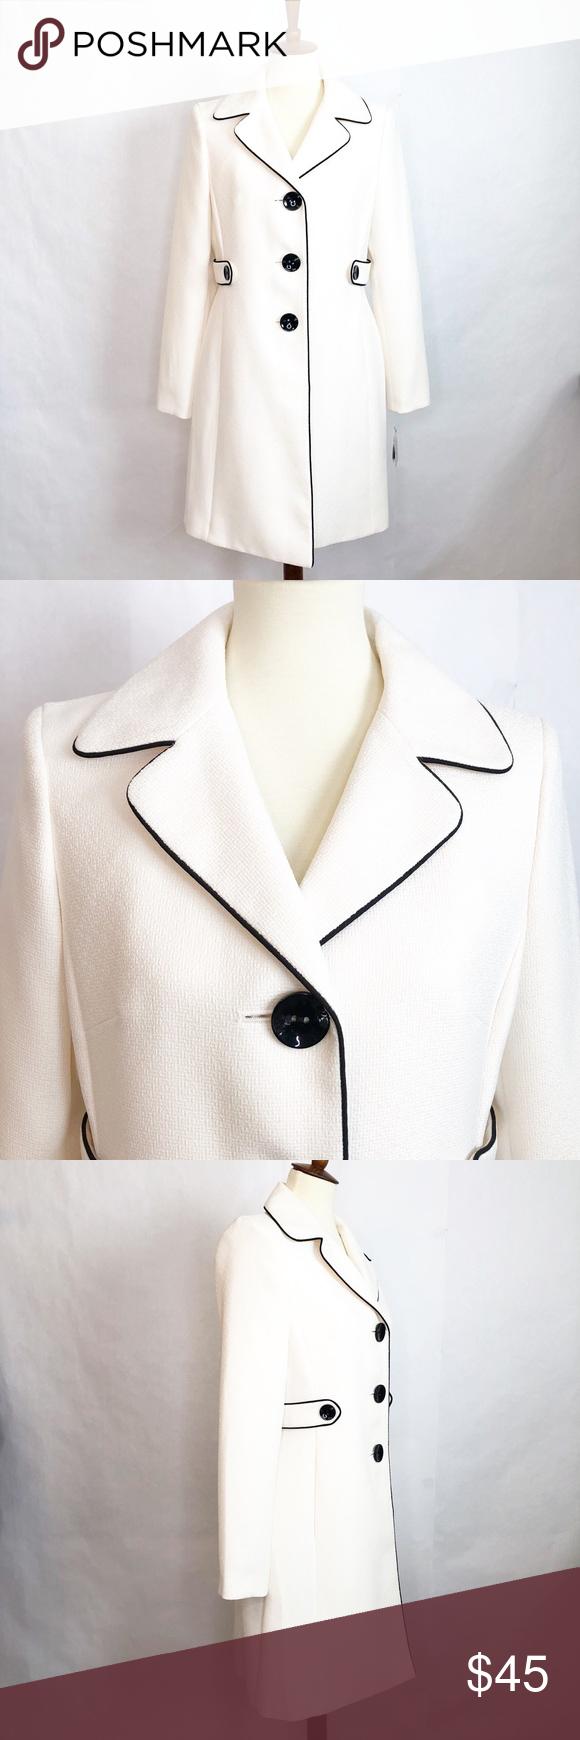 Kasper Separates Winter White Dress Coat Sz 8 Nwt Coat Dress White Dress Winter Coat [ 1740 x 580 Pixel ]